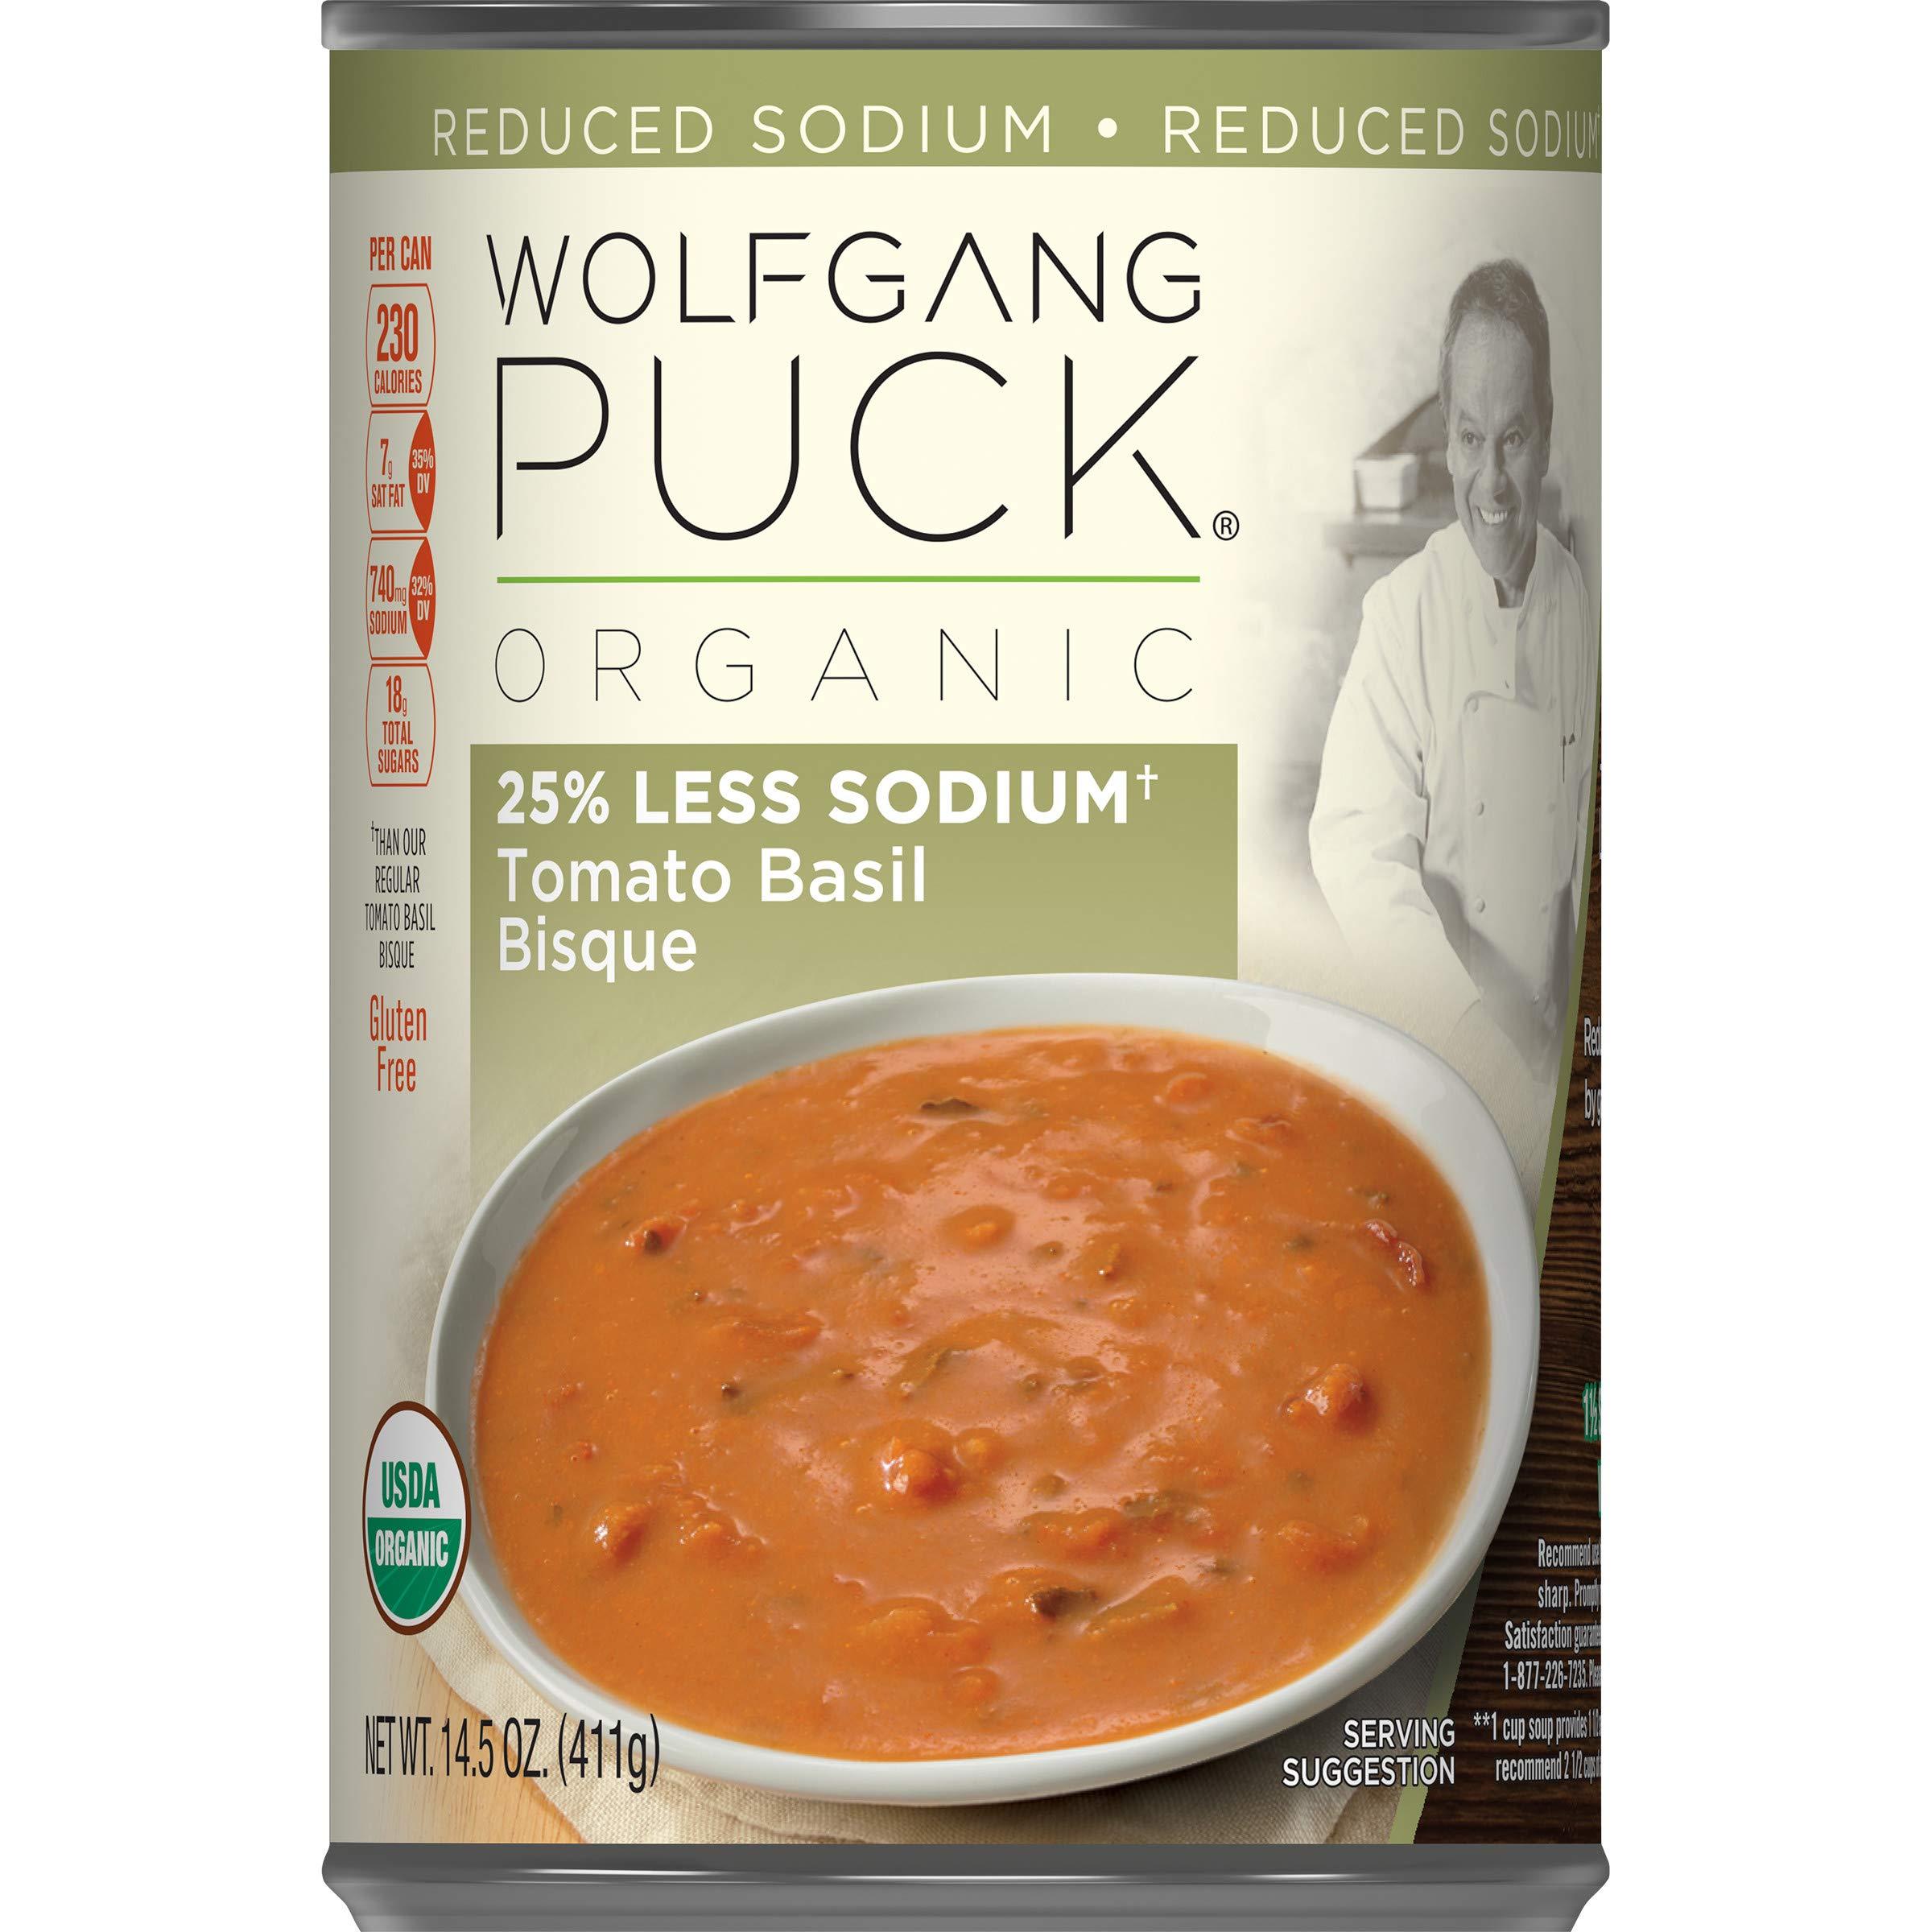 Wolfgang Puck Organic 25% Less Sodium Tomato Basil Bisque, 14.5 Oz Can